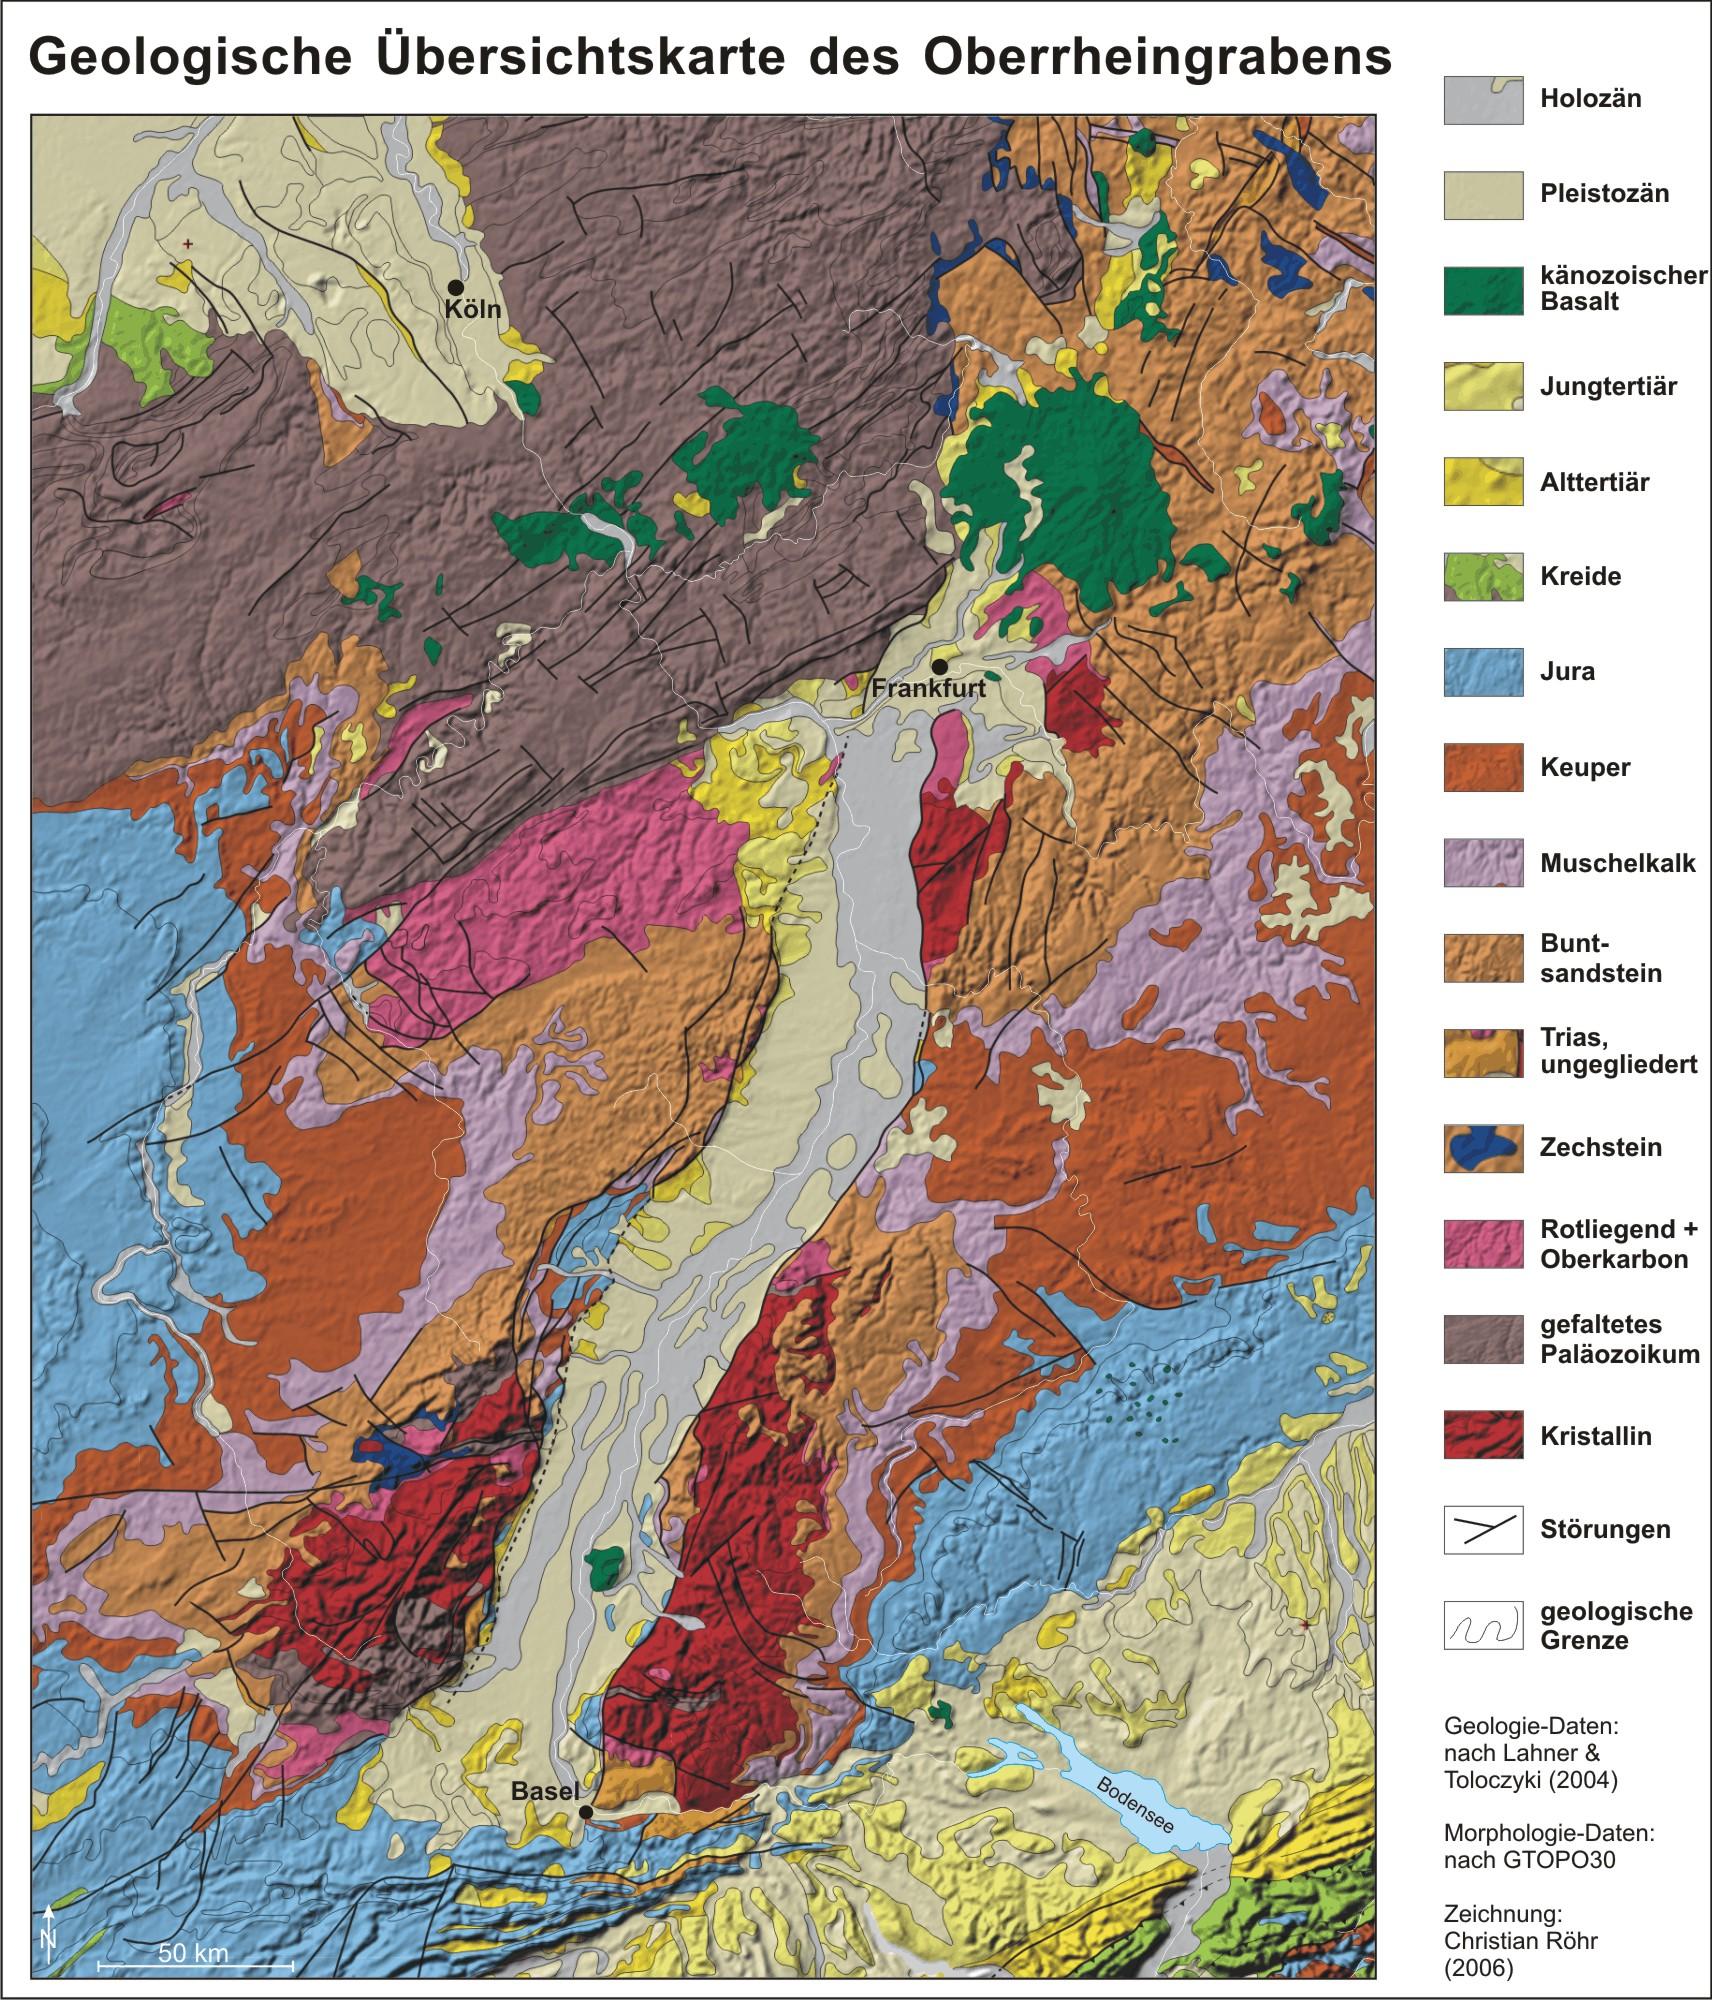 geologische karte baden württemberg Geologische Karte des Oberrheingrabens geologische karte baden württemberg